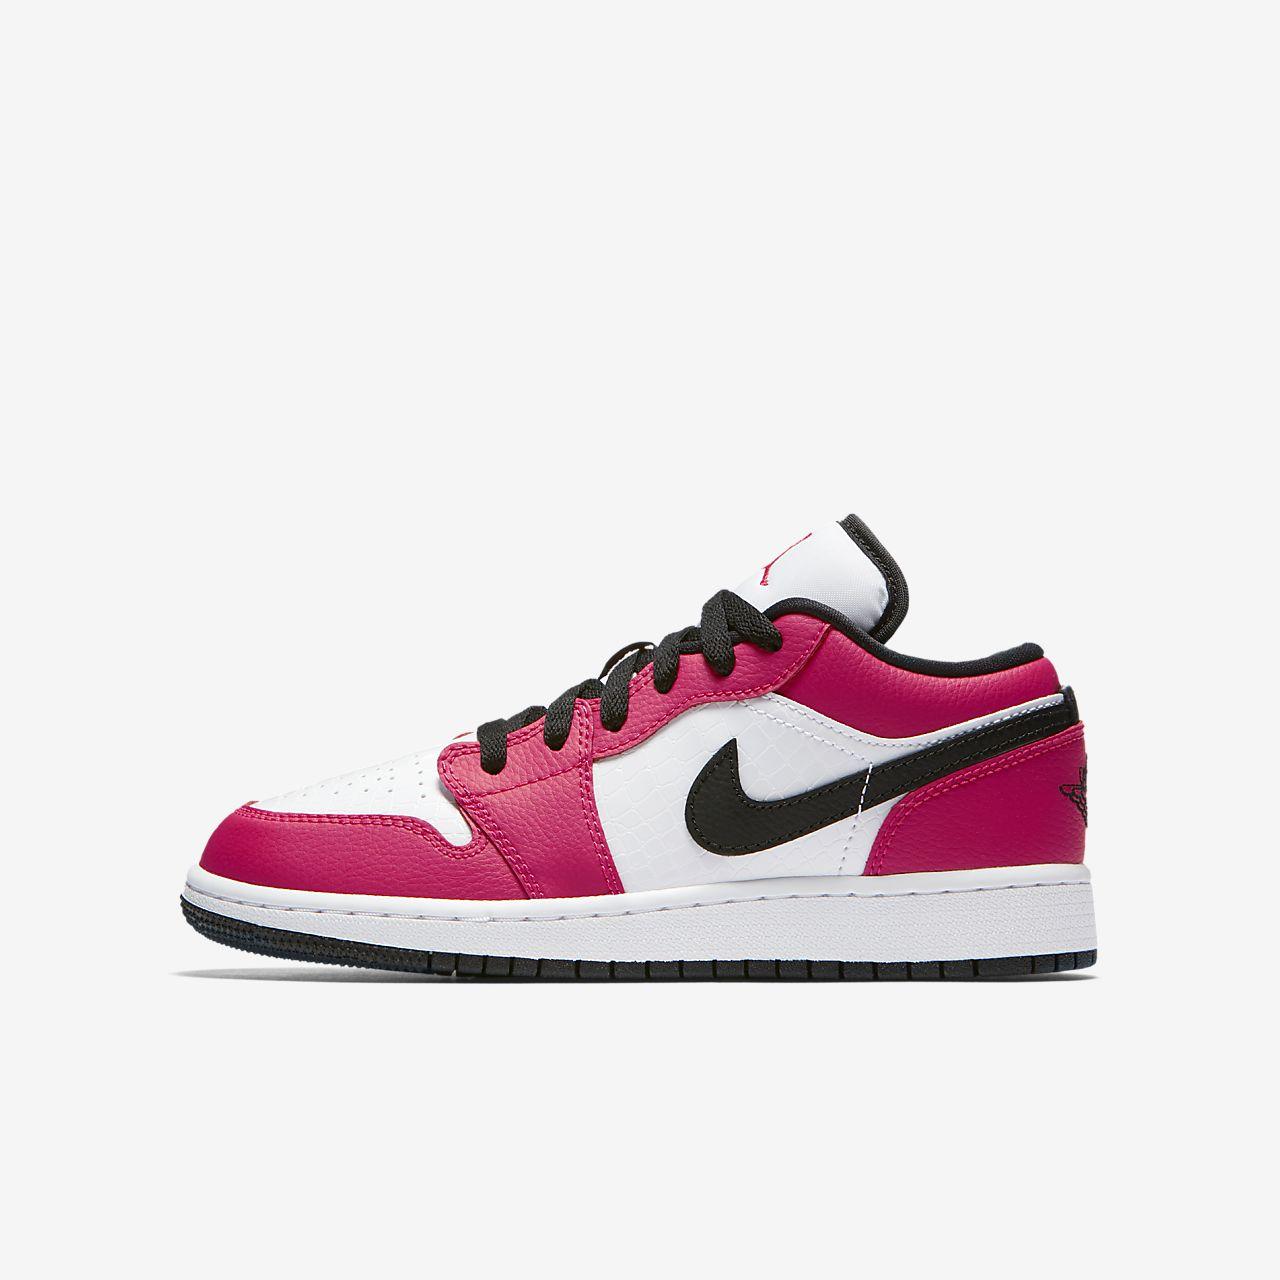 Air Jordan 1 Low GG 大童(女孩)运动童鞋